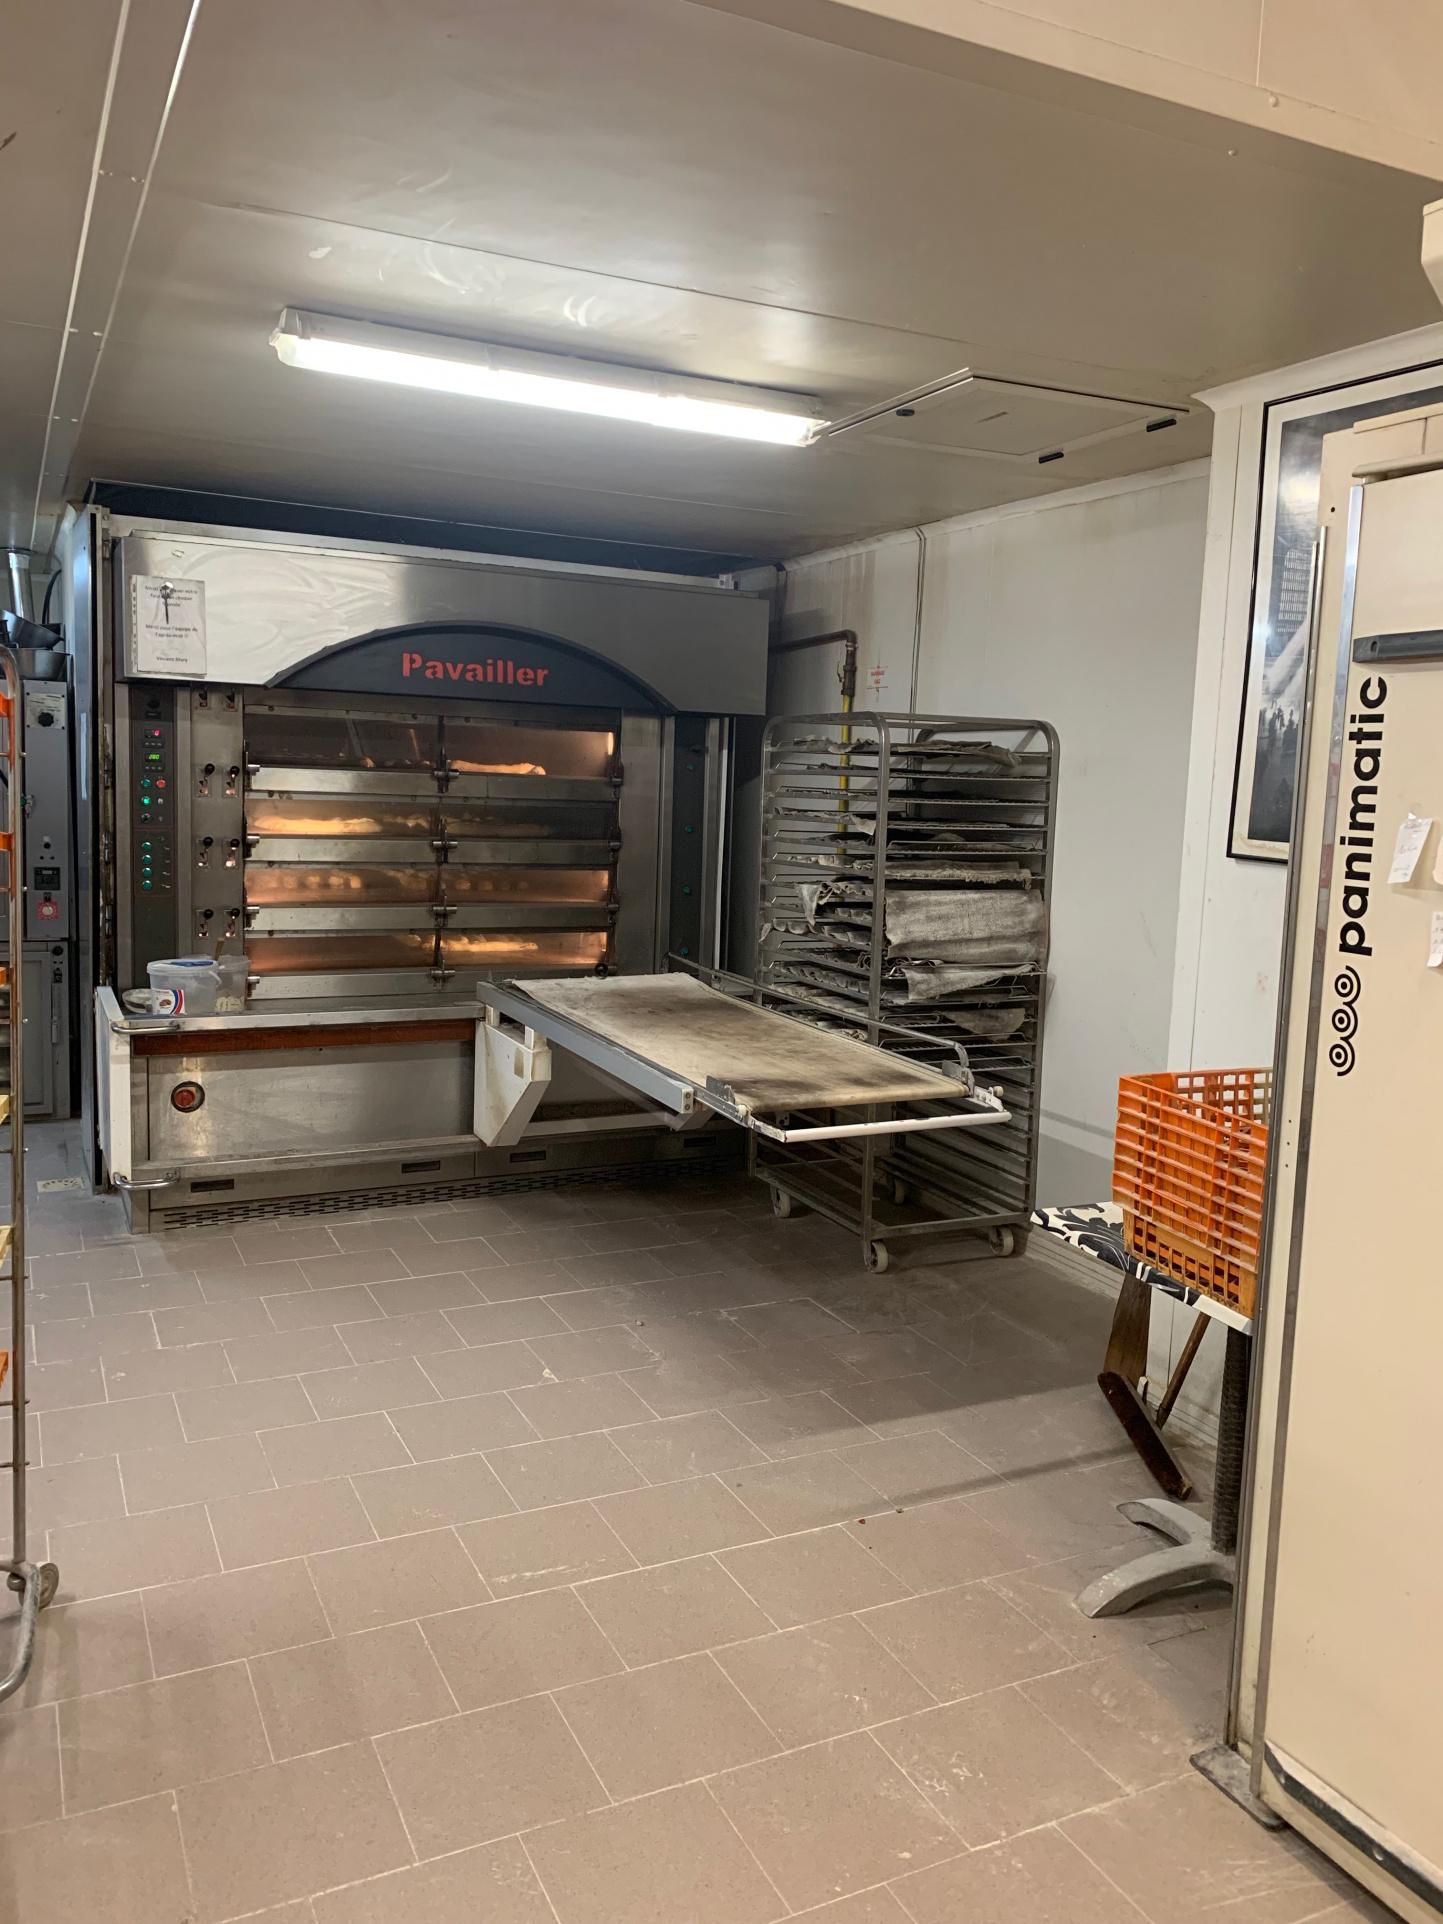 BOULANGERIE PATISSERIE SNACKING A NICE  - Boulangerie Pâtisserie